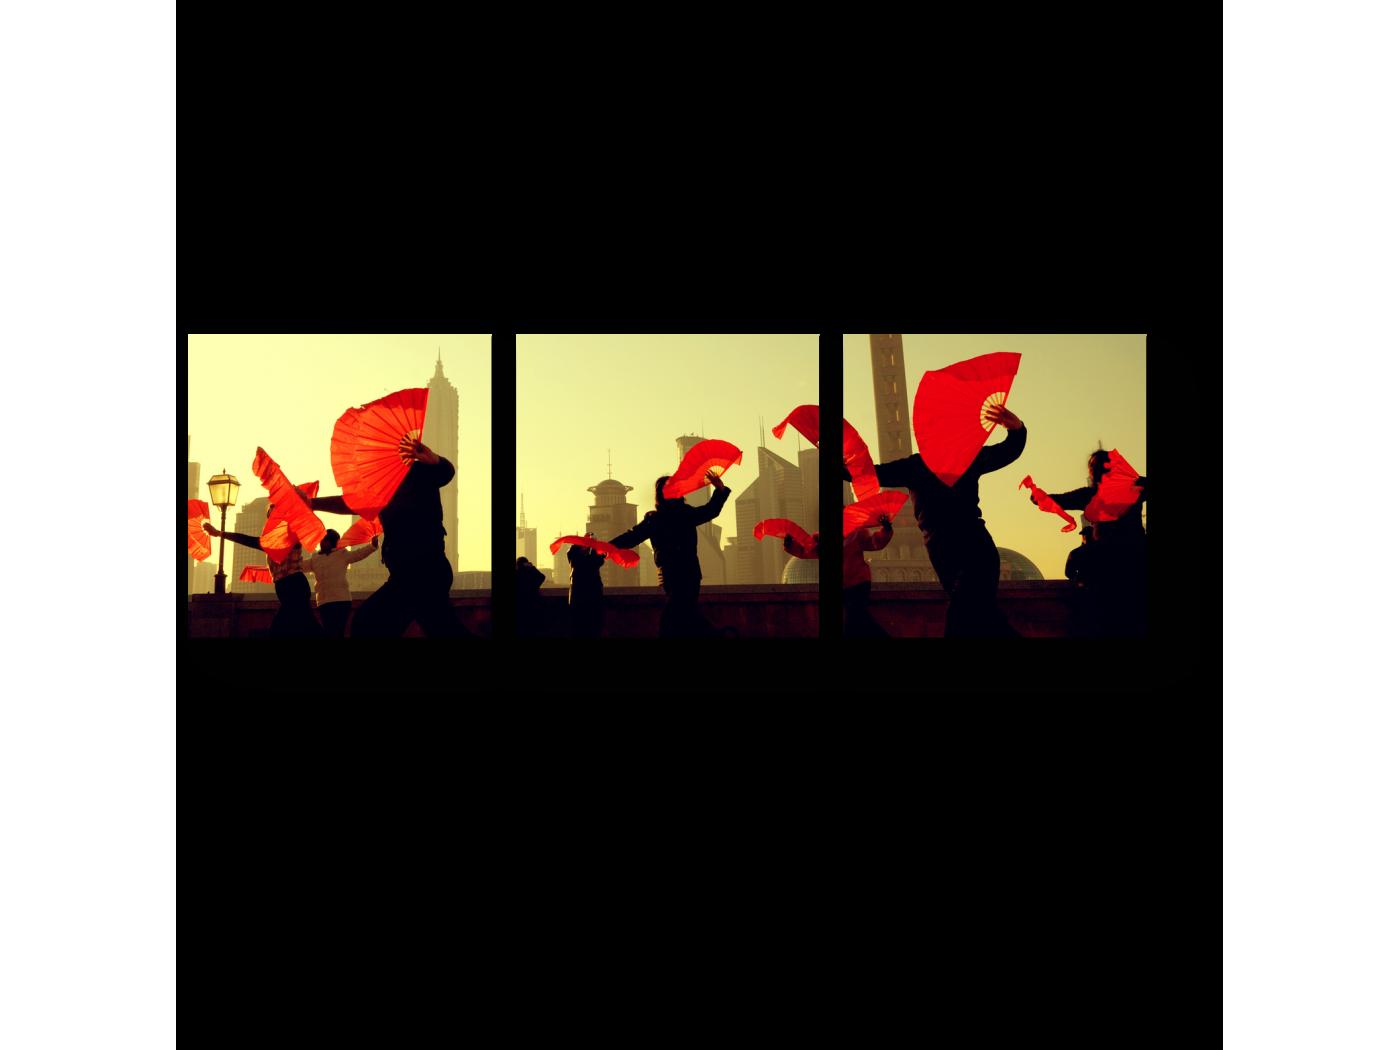 Модульная картина Китайская культура танца (60x20) фото